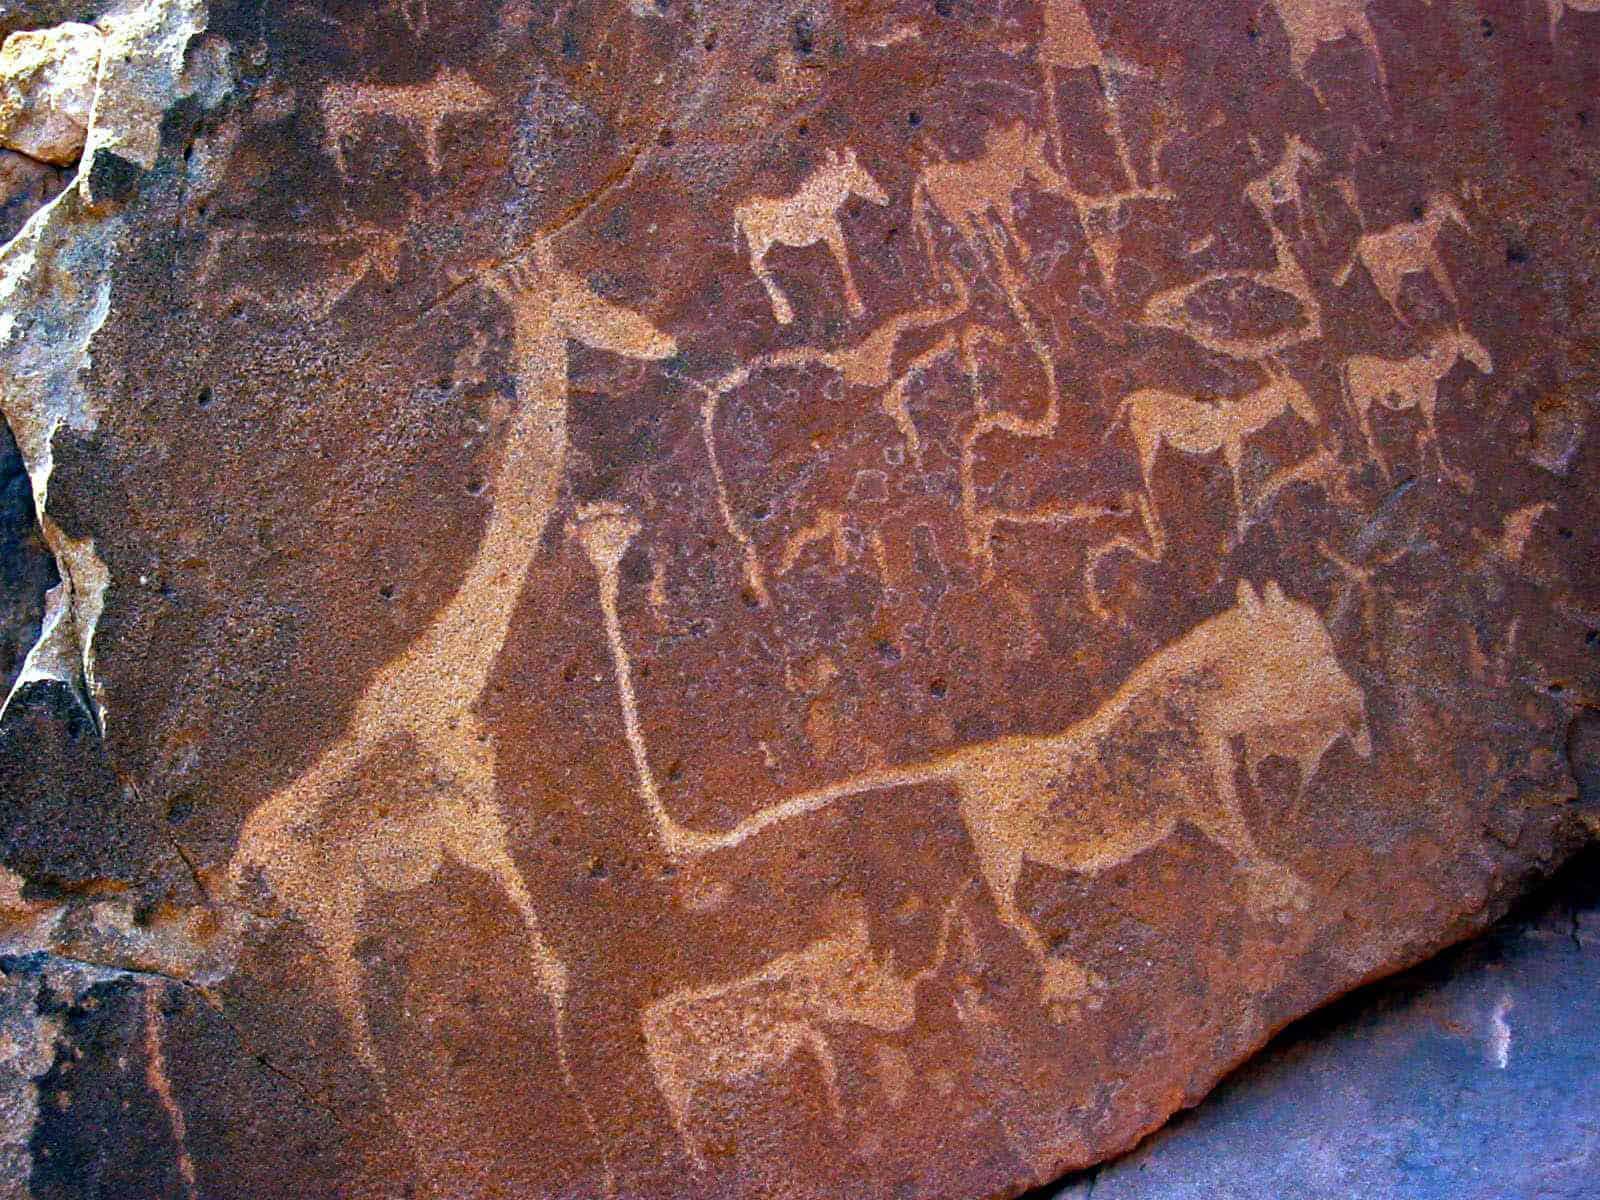 Twyfelfontein World Heritage Site – Bushman Engravings